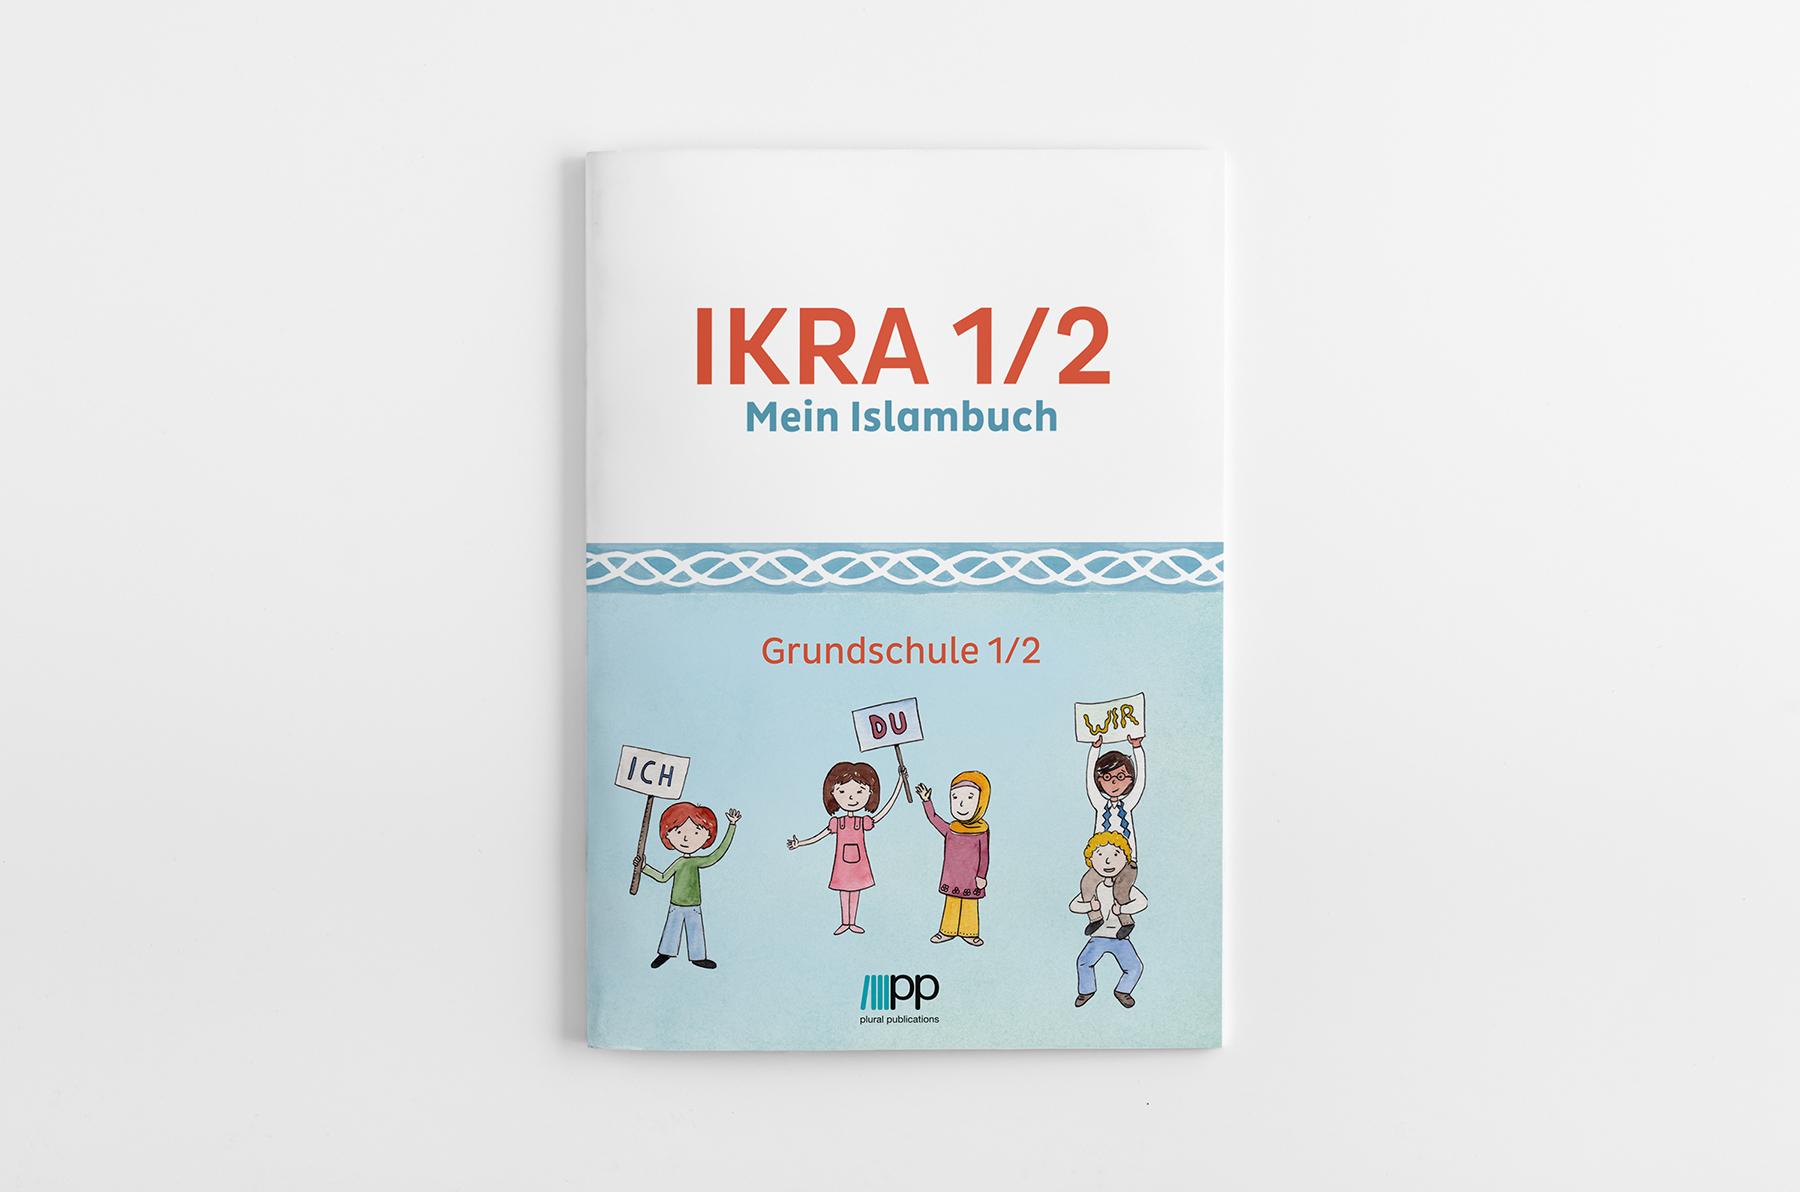 Islam, Islam-Unterrichtsmaterial, Unterrichtsmaterial, Lerhbuch, IKRA, Grundschule